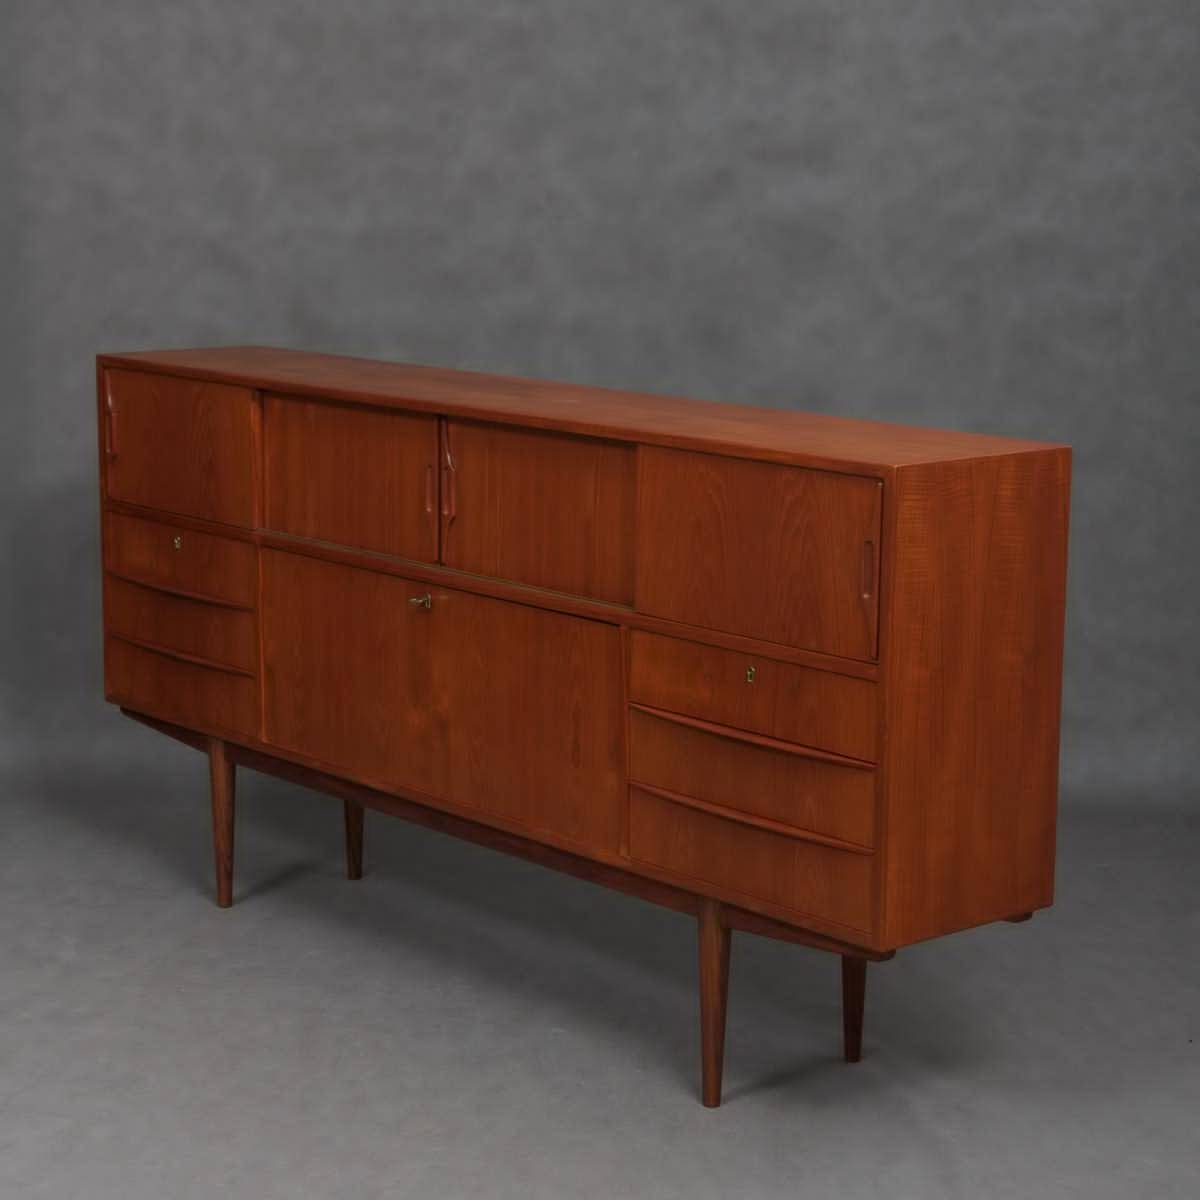 Mid Century Danish Sideboard With Illuminated Bar Cabinet, 1960S Regarding Recent Sideboard Bar Cabinet (#8 of 15)